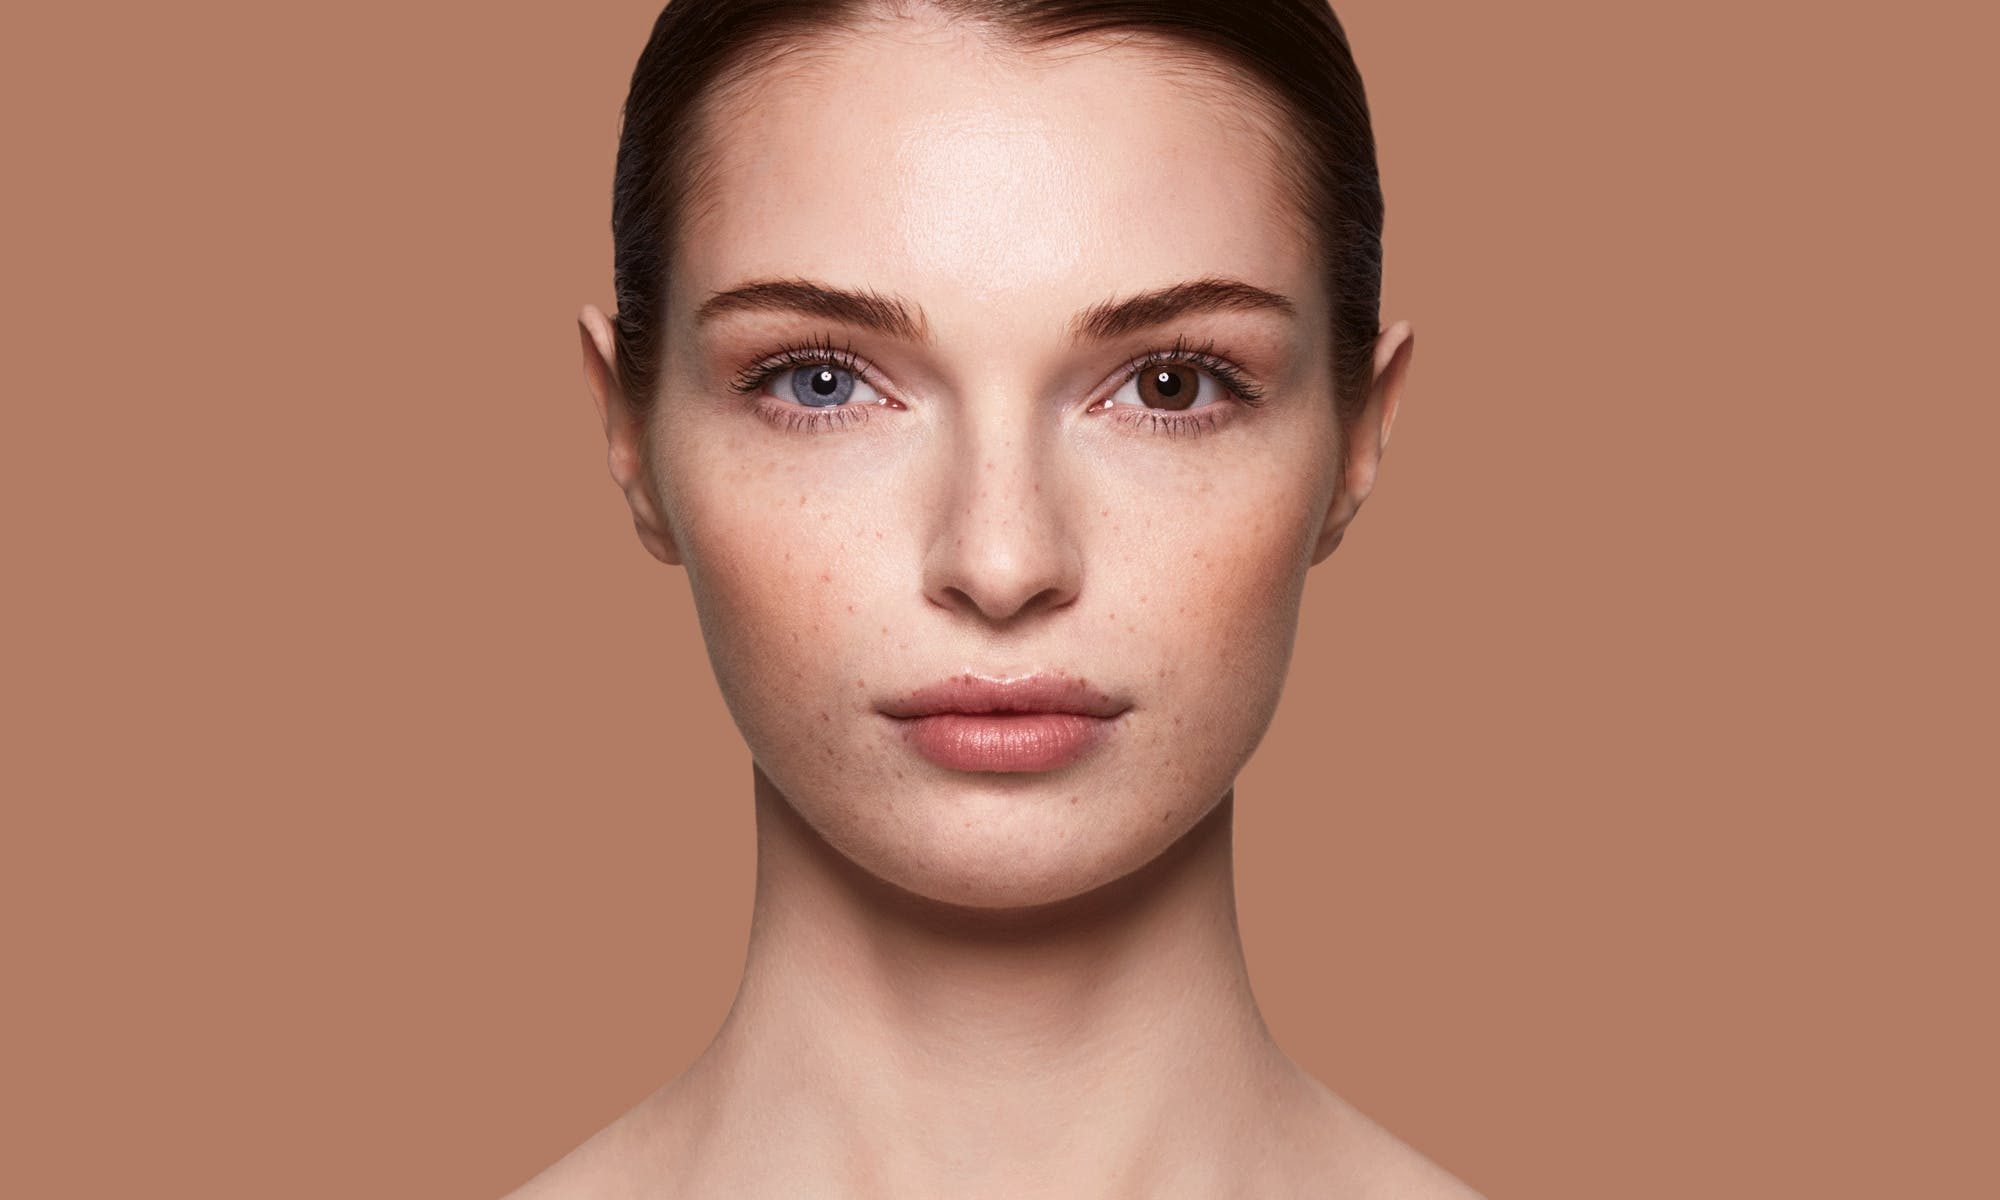 How do SWATI Dark Brown Coloured Bronze lenses look on blue eyes?